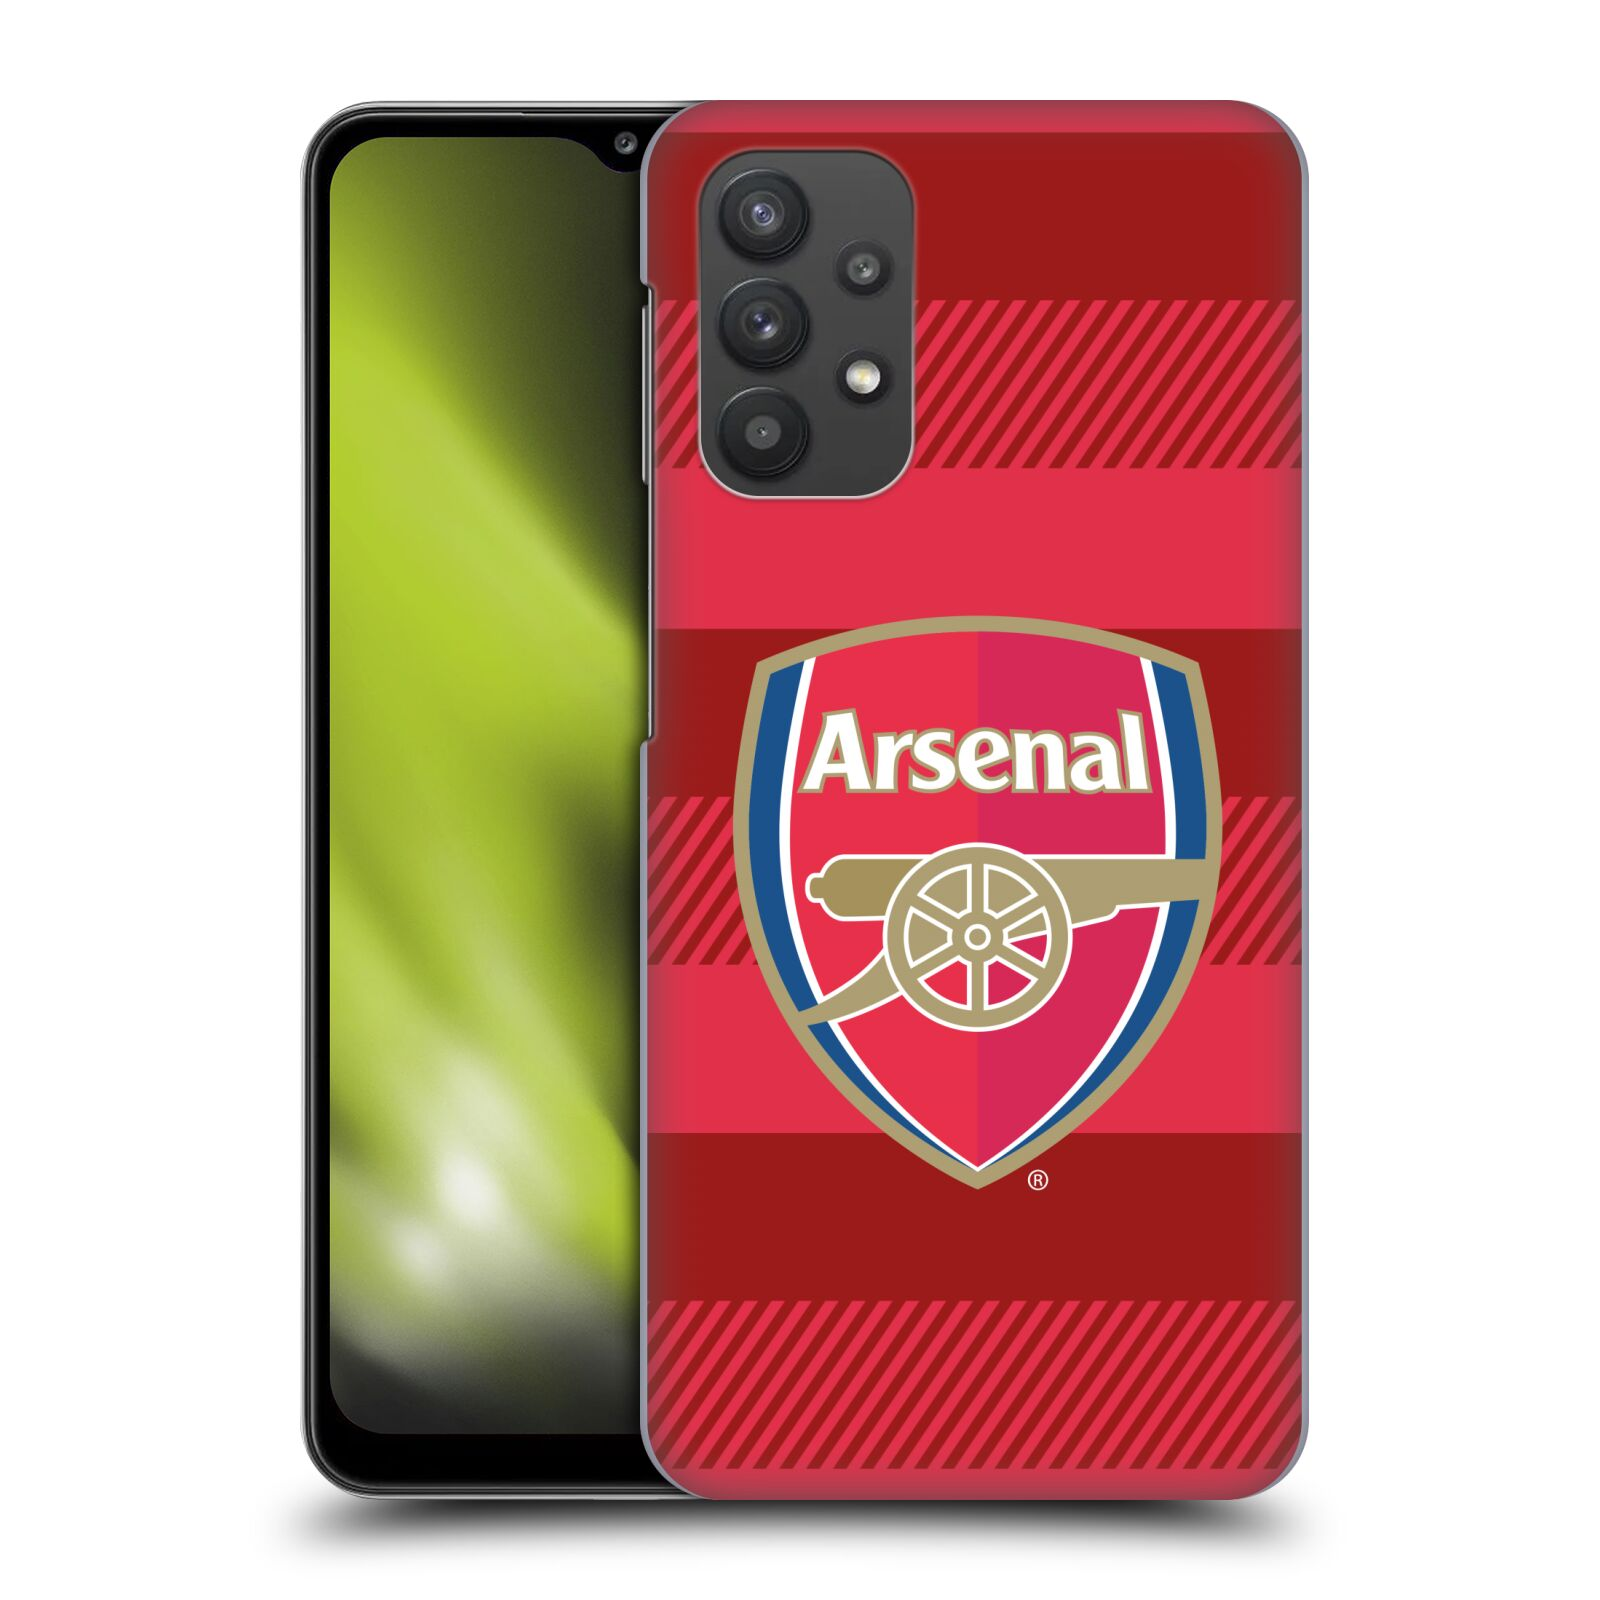 Plastové pouzdro na mobil Samsung Galaxy A32 5G - Head Case - Arsenal FC - Logo s pruhy